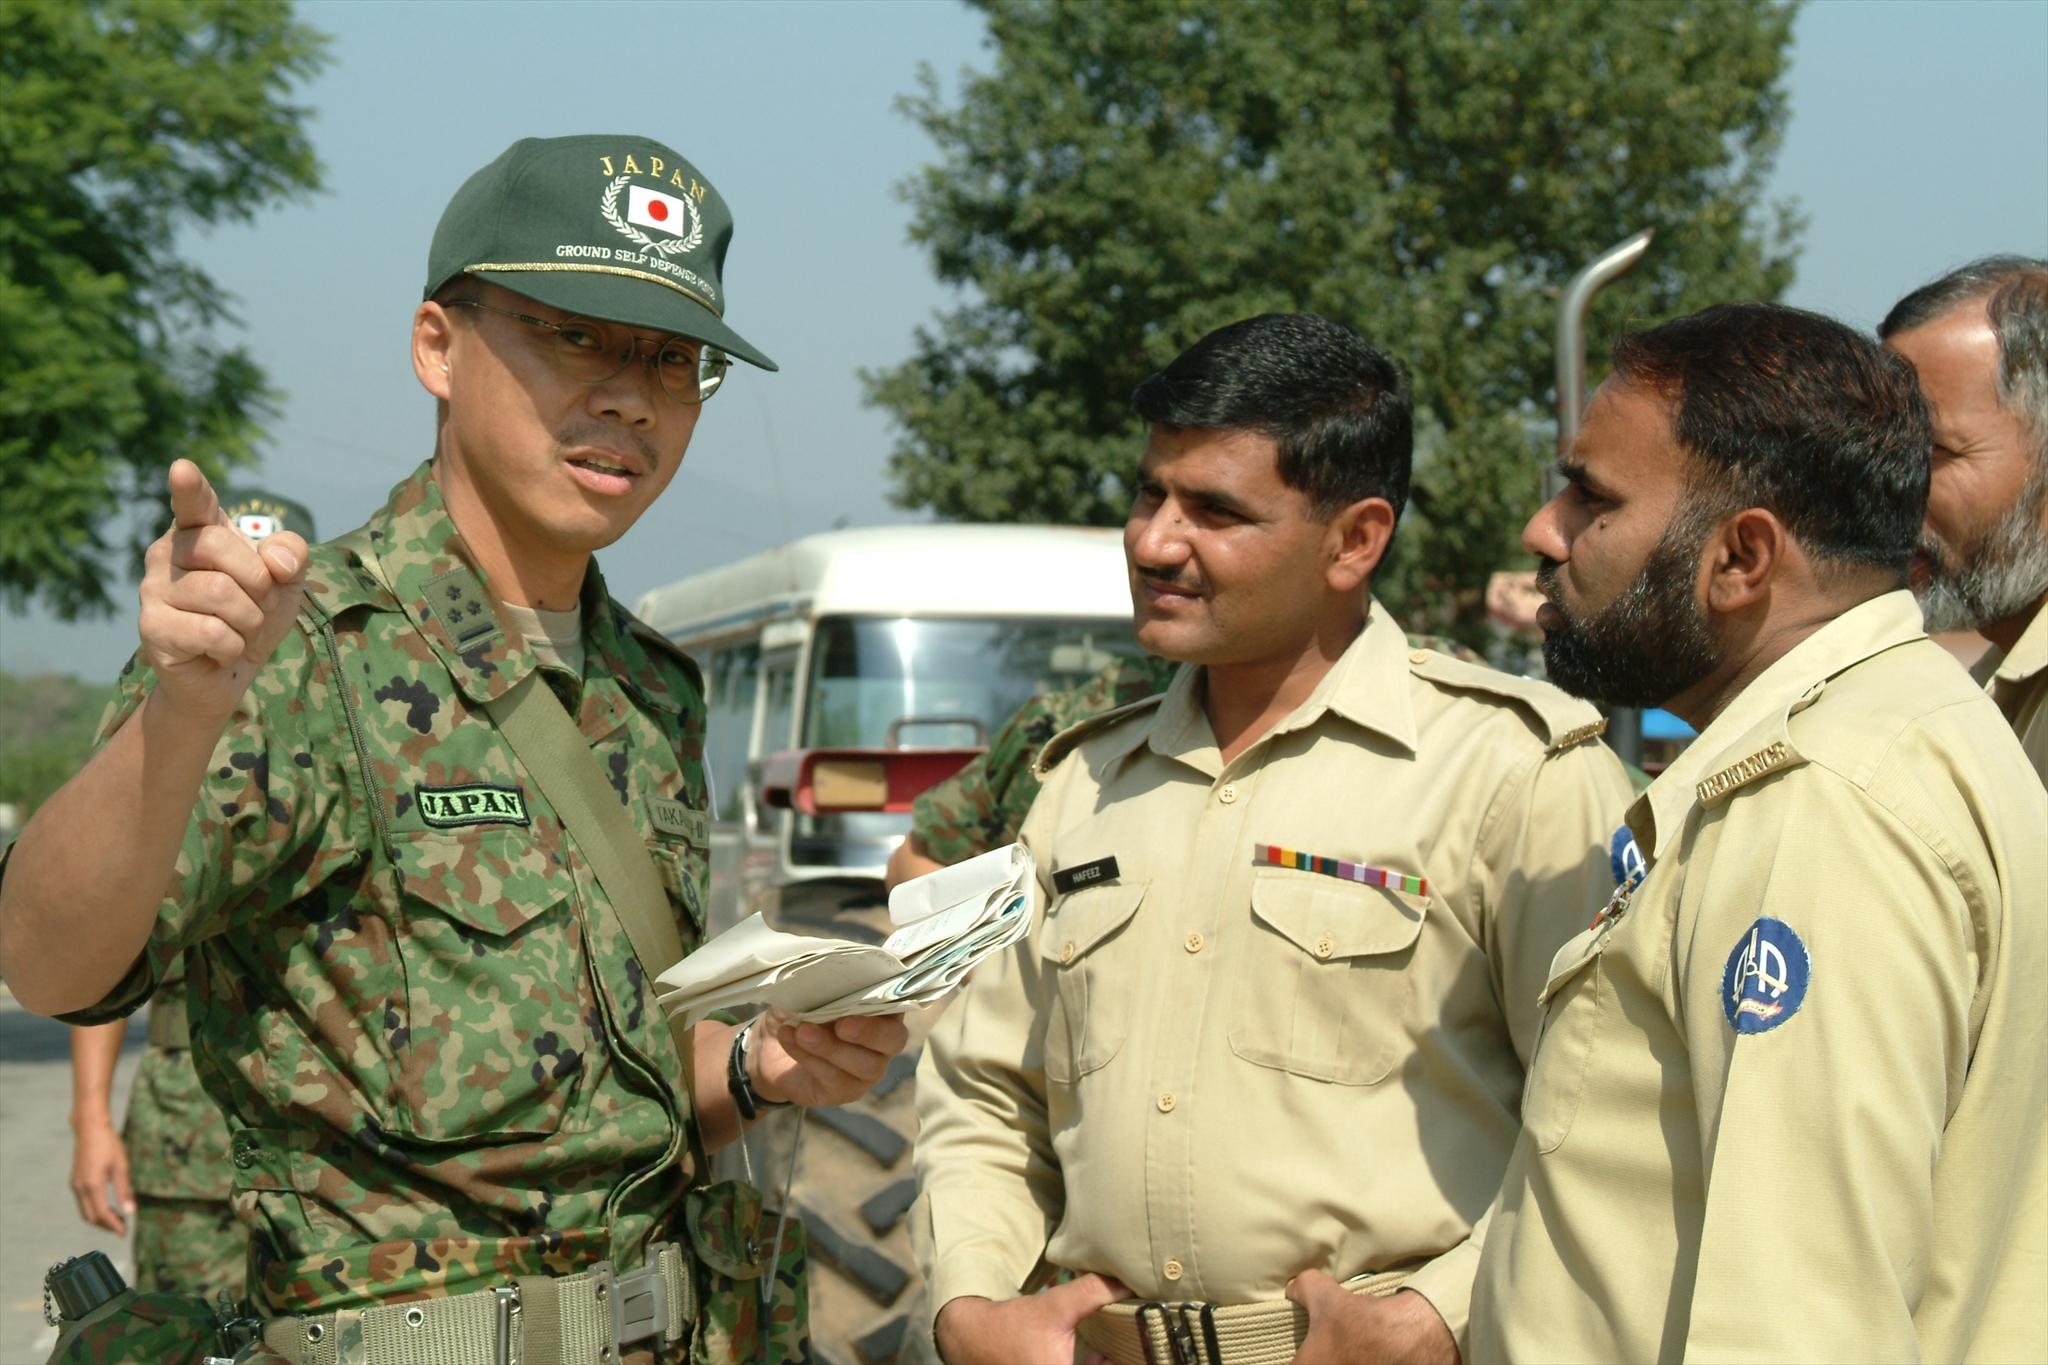 File:パキ・パキスタン軍との調整風景 R 国際平和協力活動等(及び防衛協力等) 55.jpg